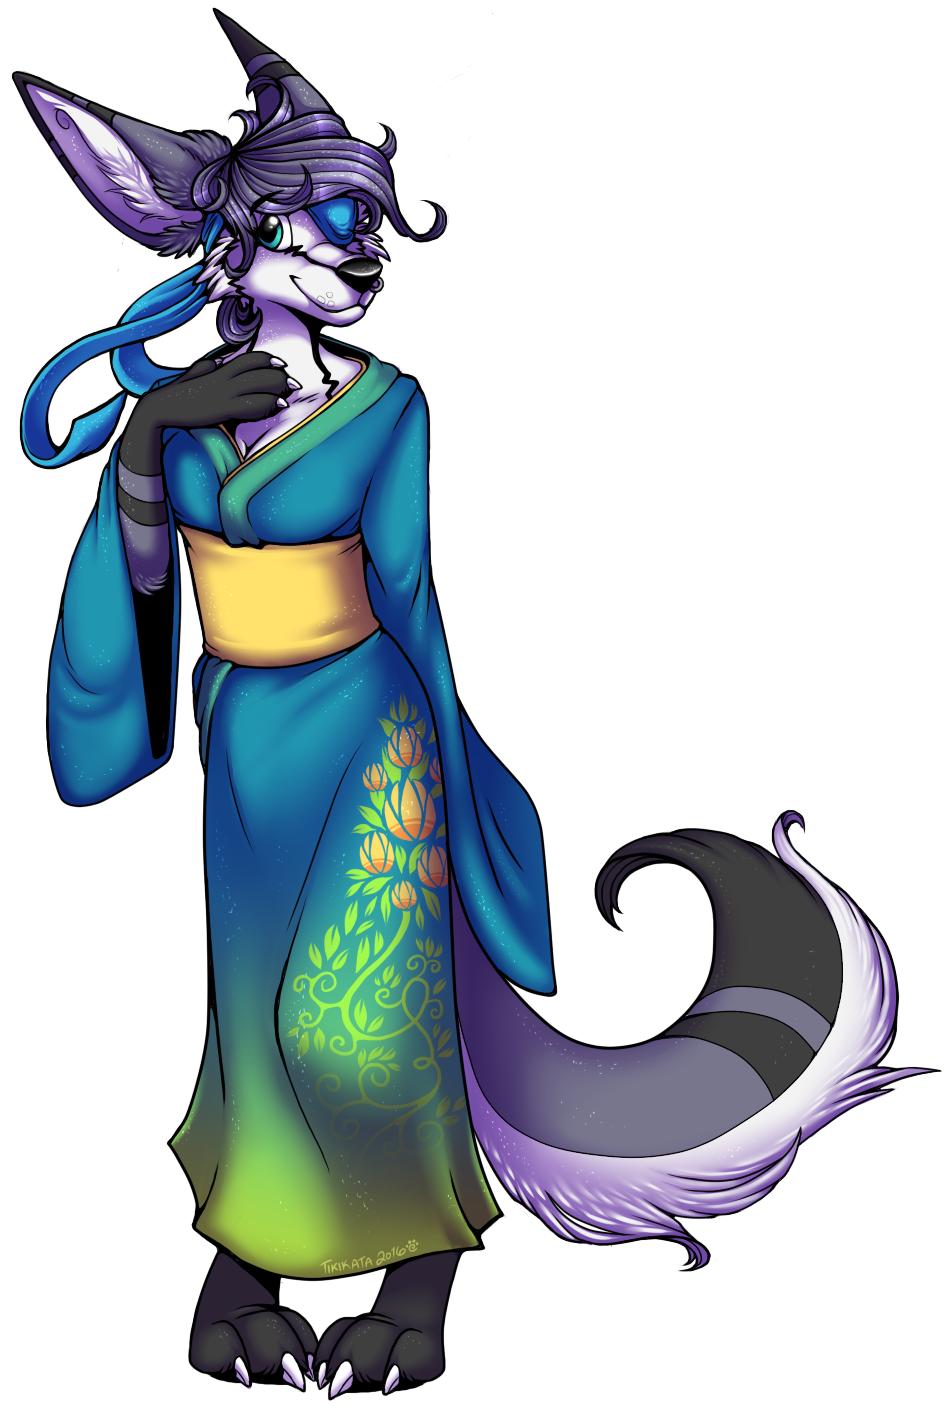 Lolo's Kimono (Commission)